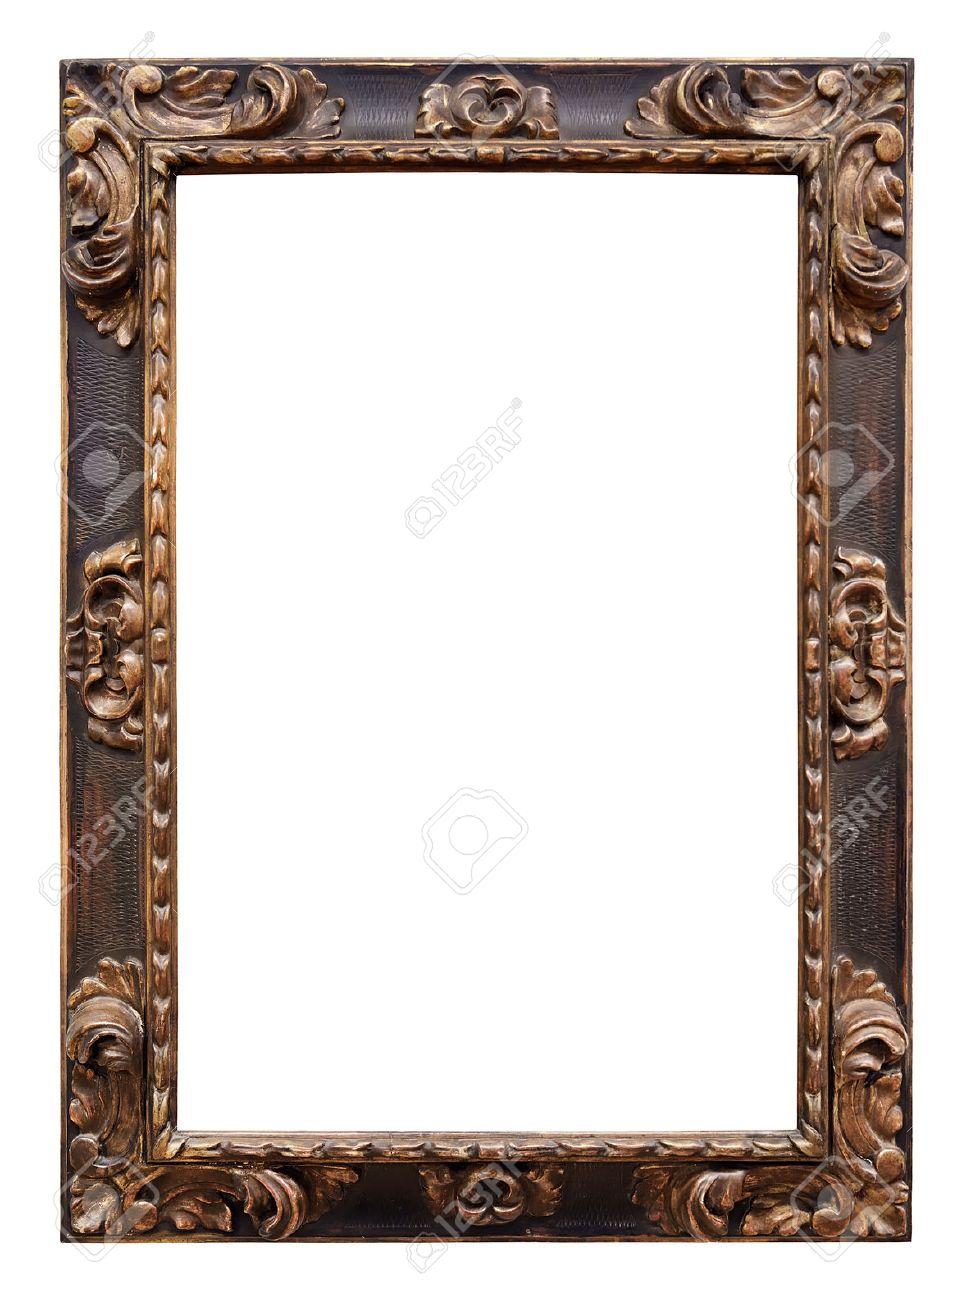 frame vintage wooden frame isolated on white background stock photo